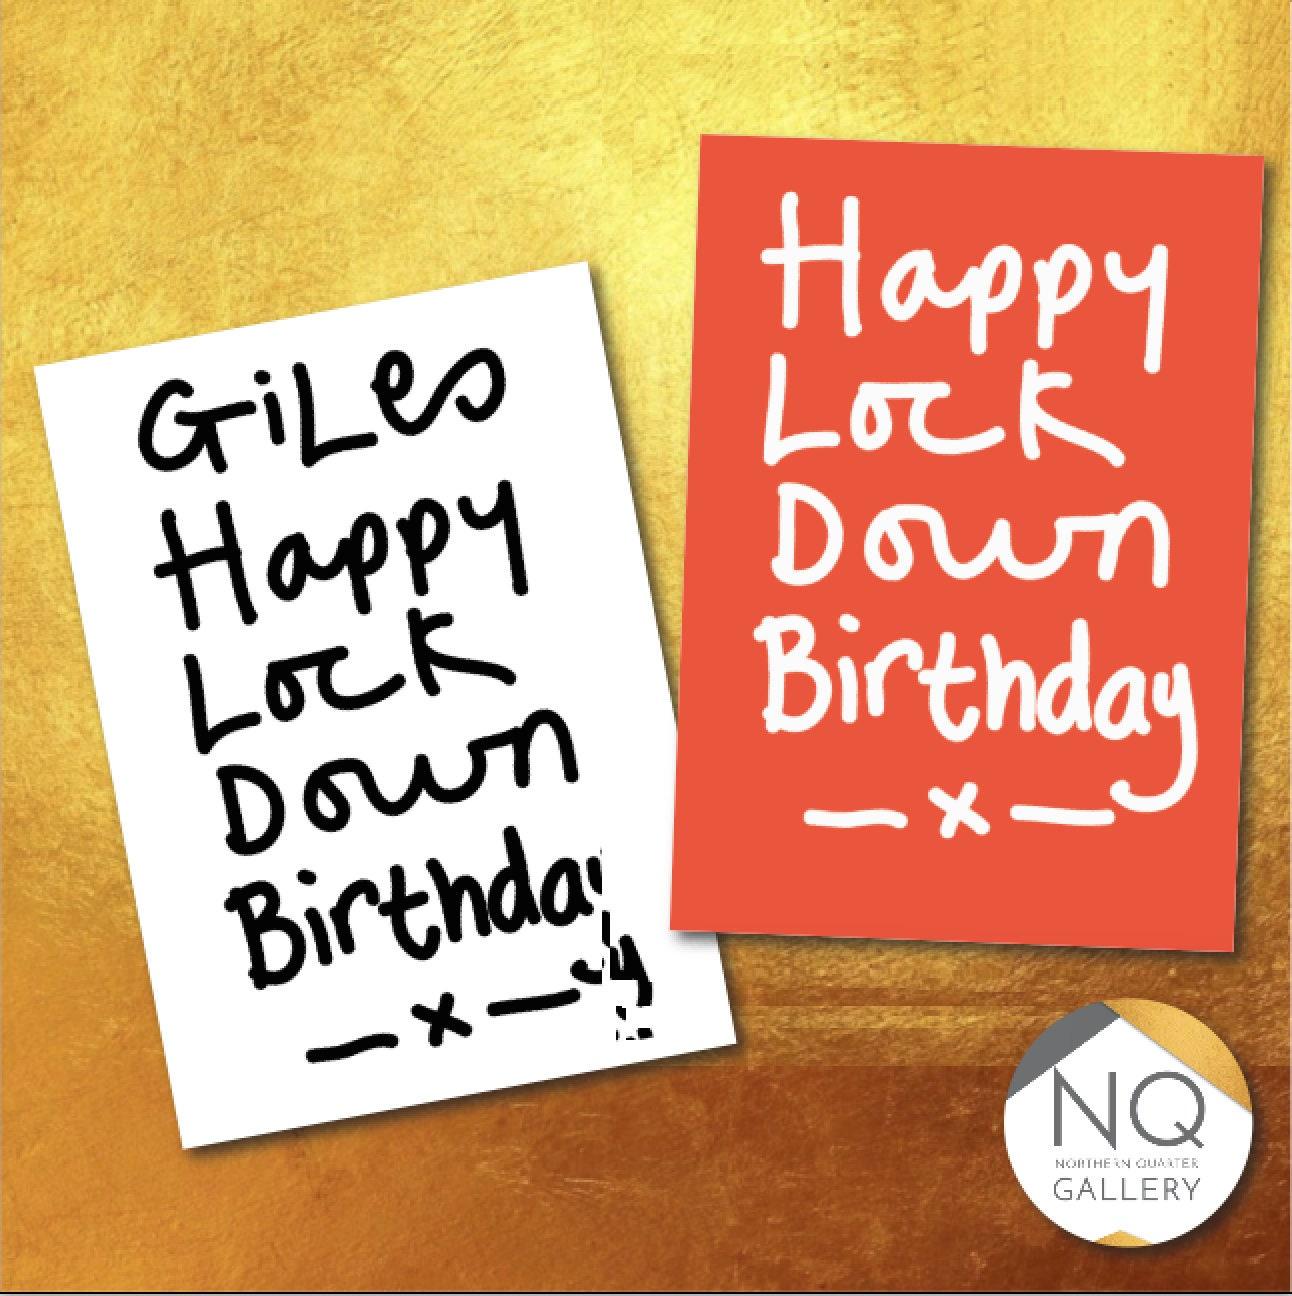 Happy LockDown Birthday